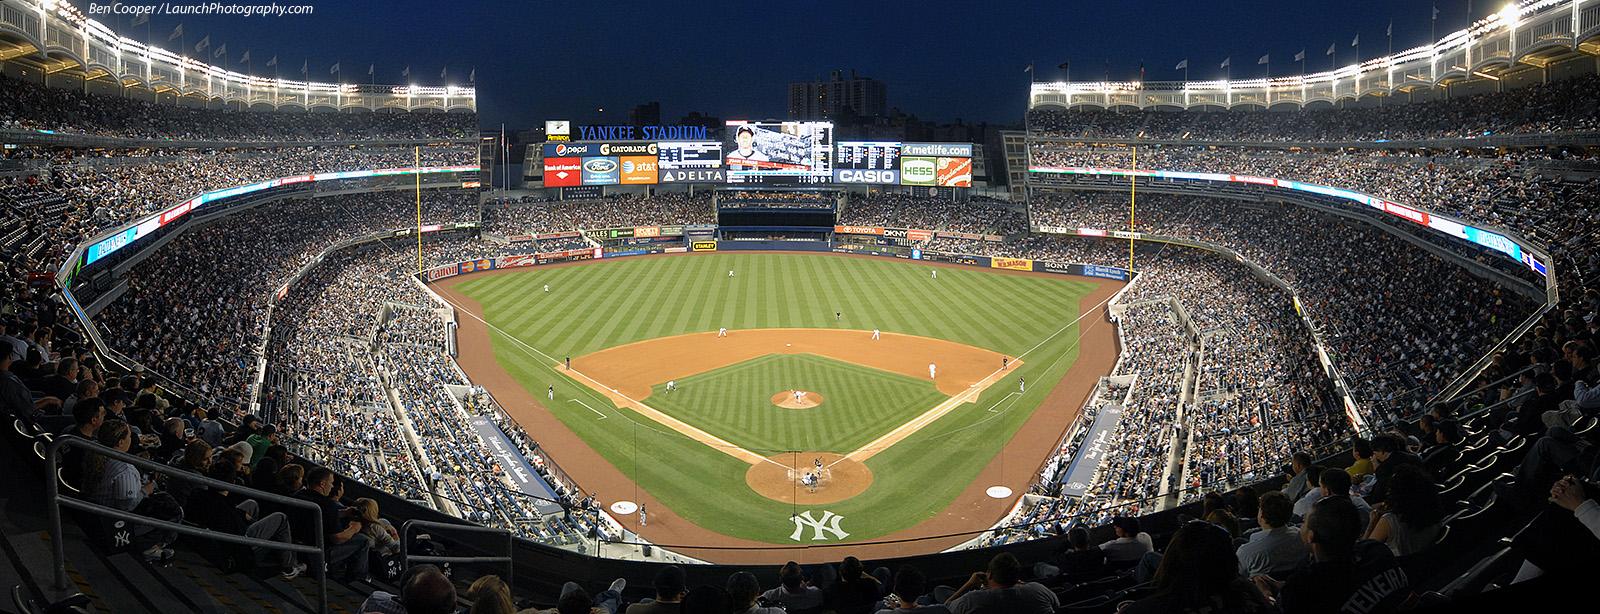 Yankees 6 White Sox 4 Homepage Ballparks Old Yankee Stadium Panoramas 1600x614